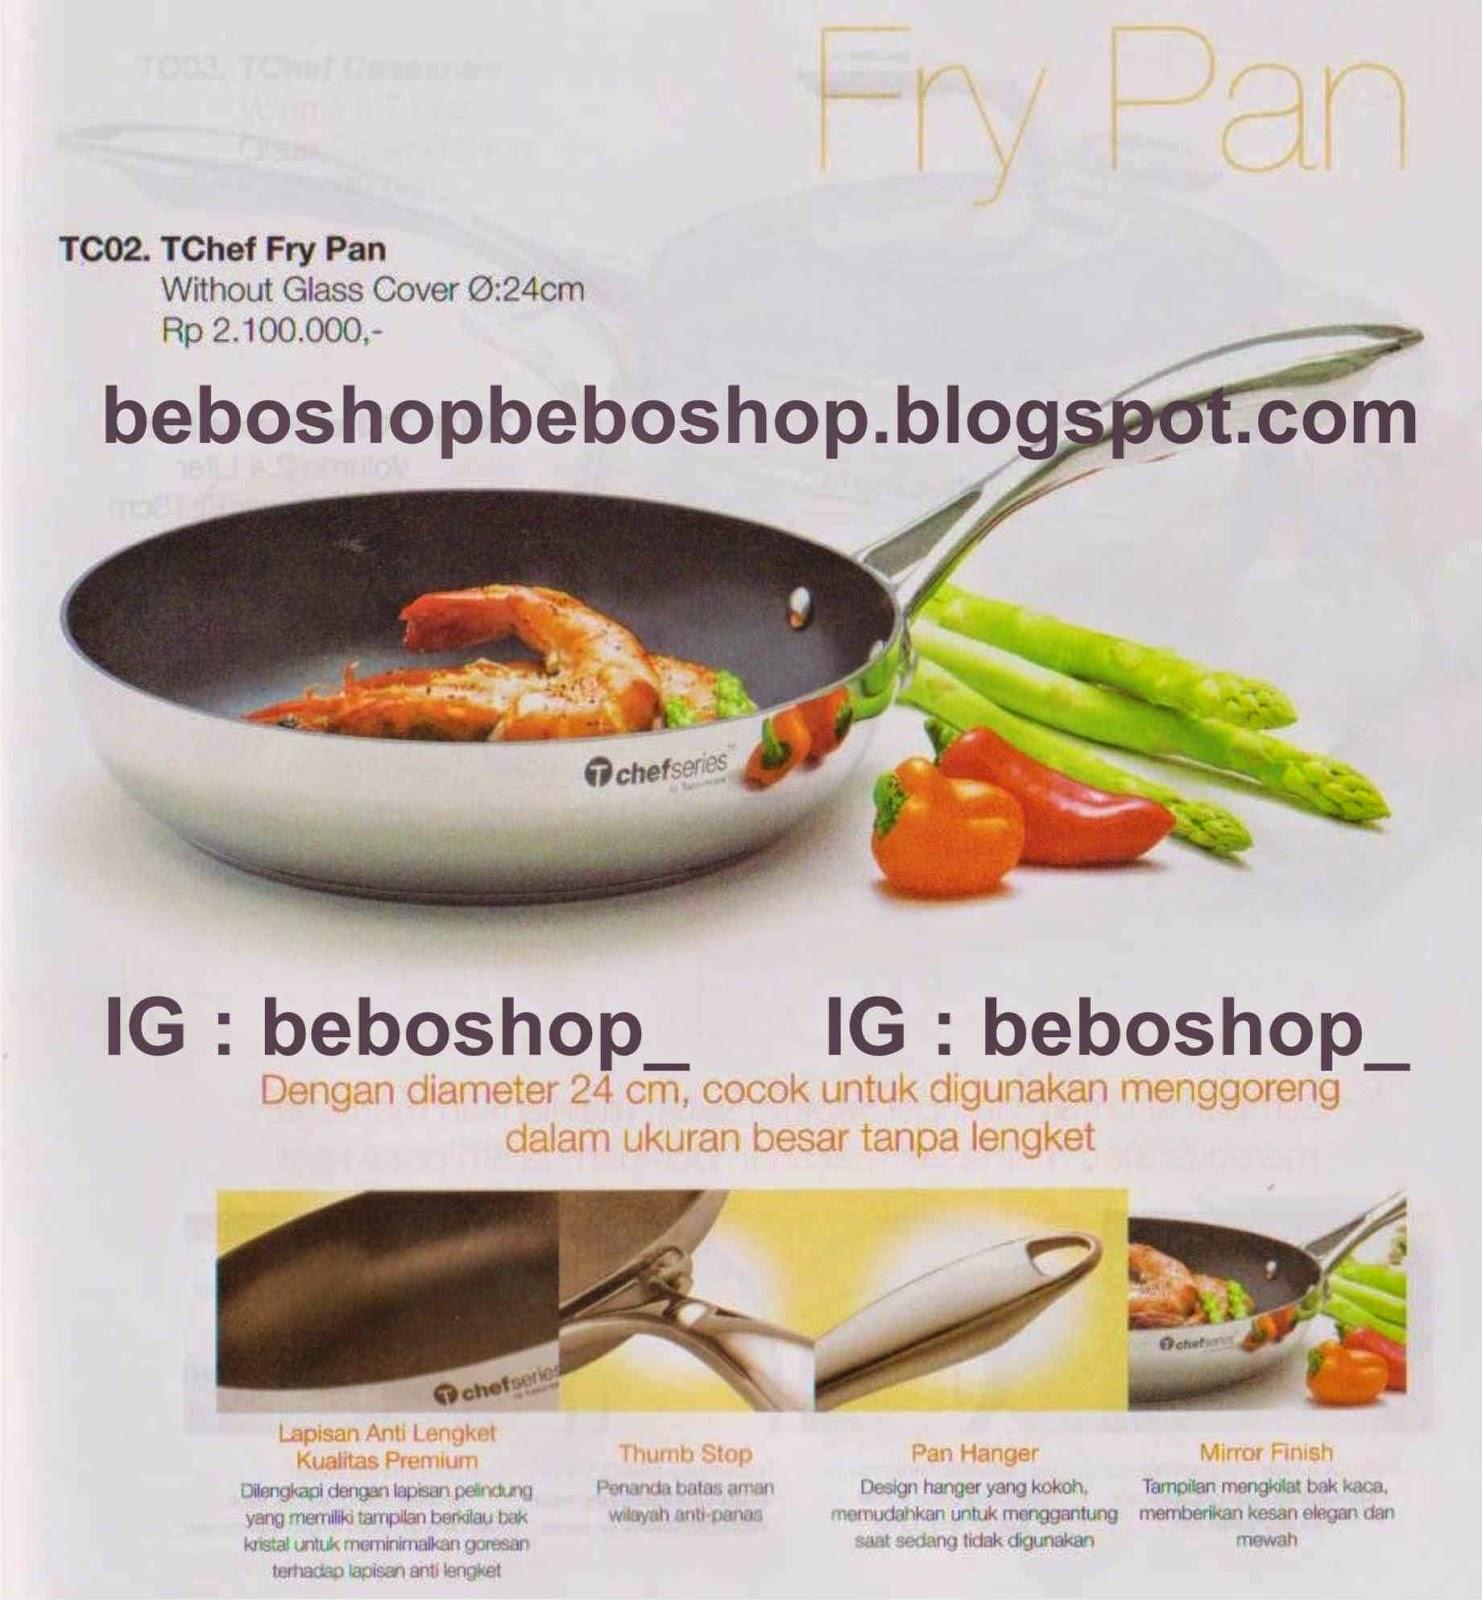 Beboshop Tupperware Edisi Mei 2014 Tchef Fry Pan Idr 2100000